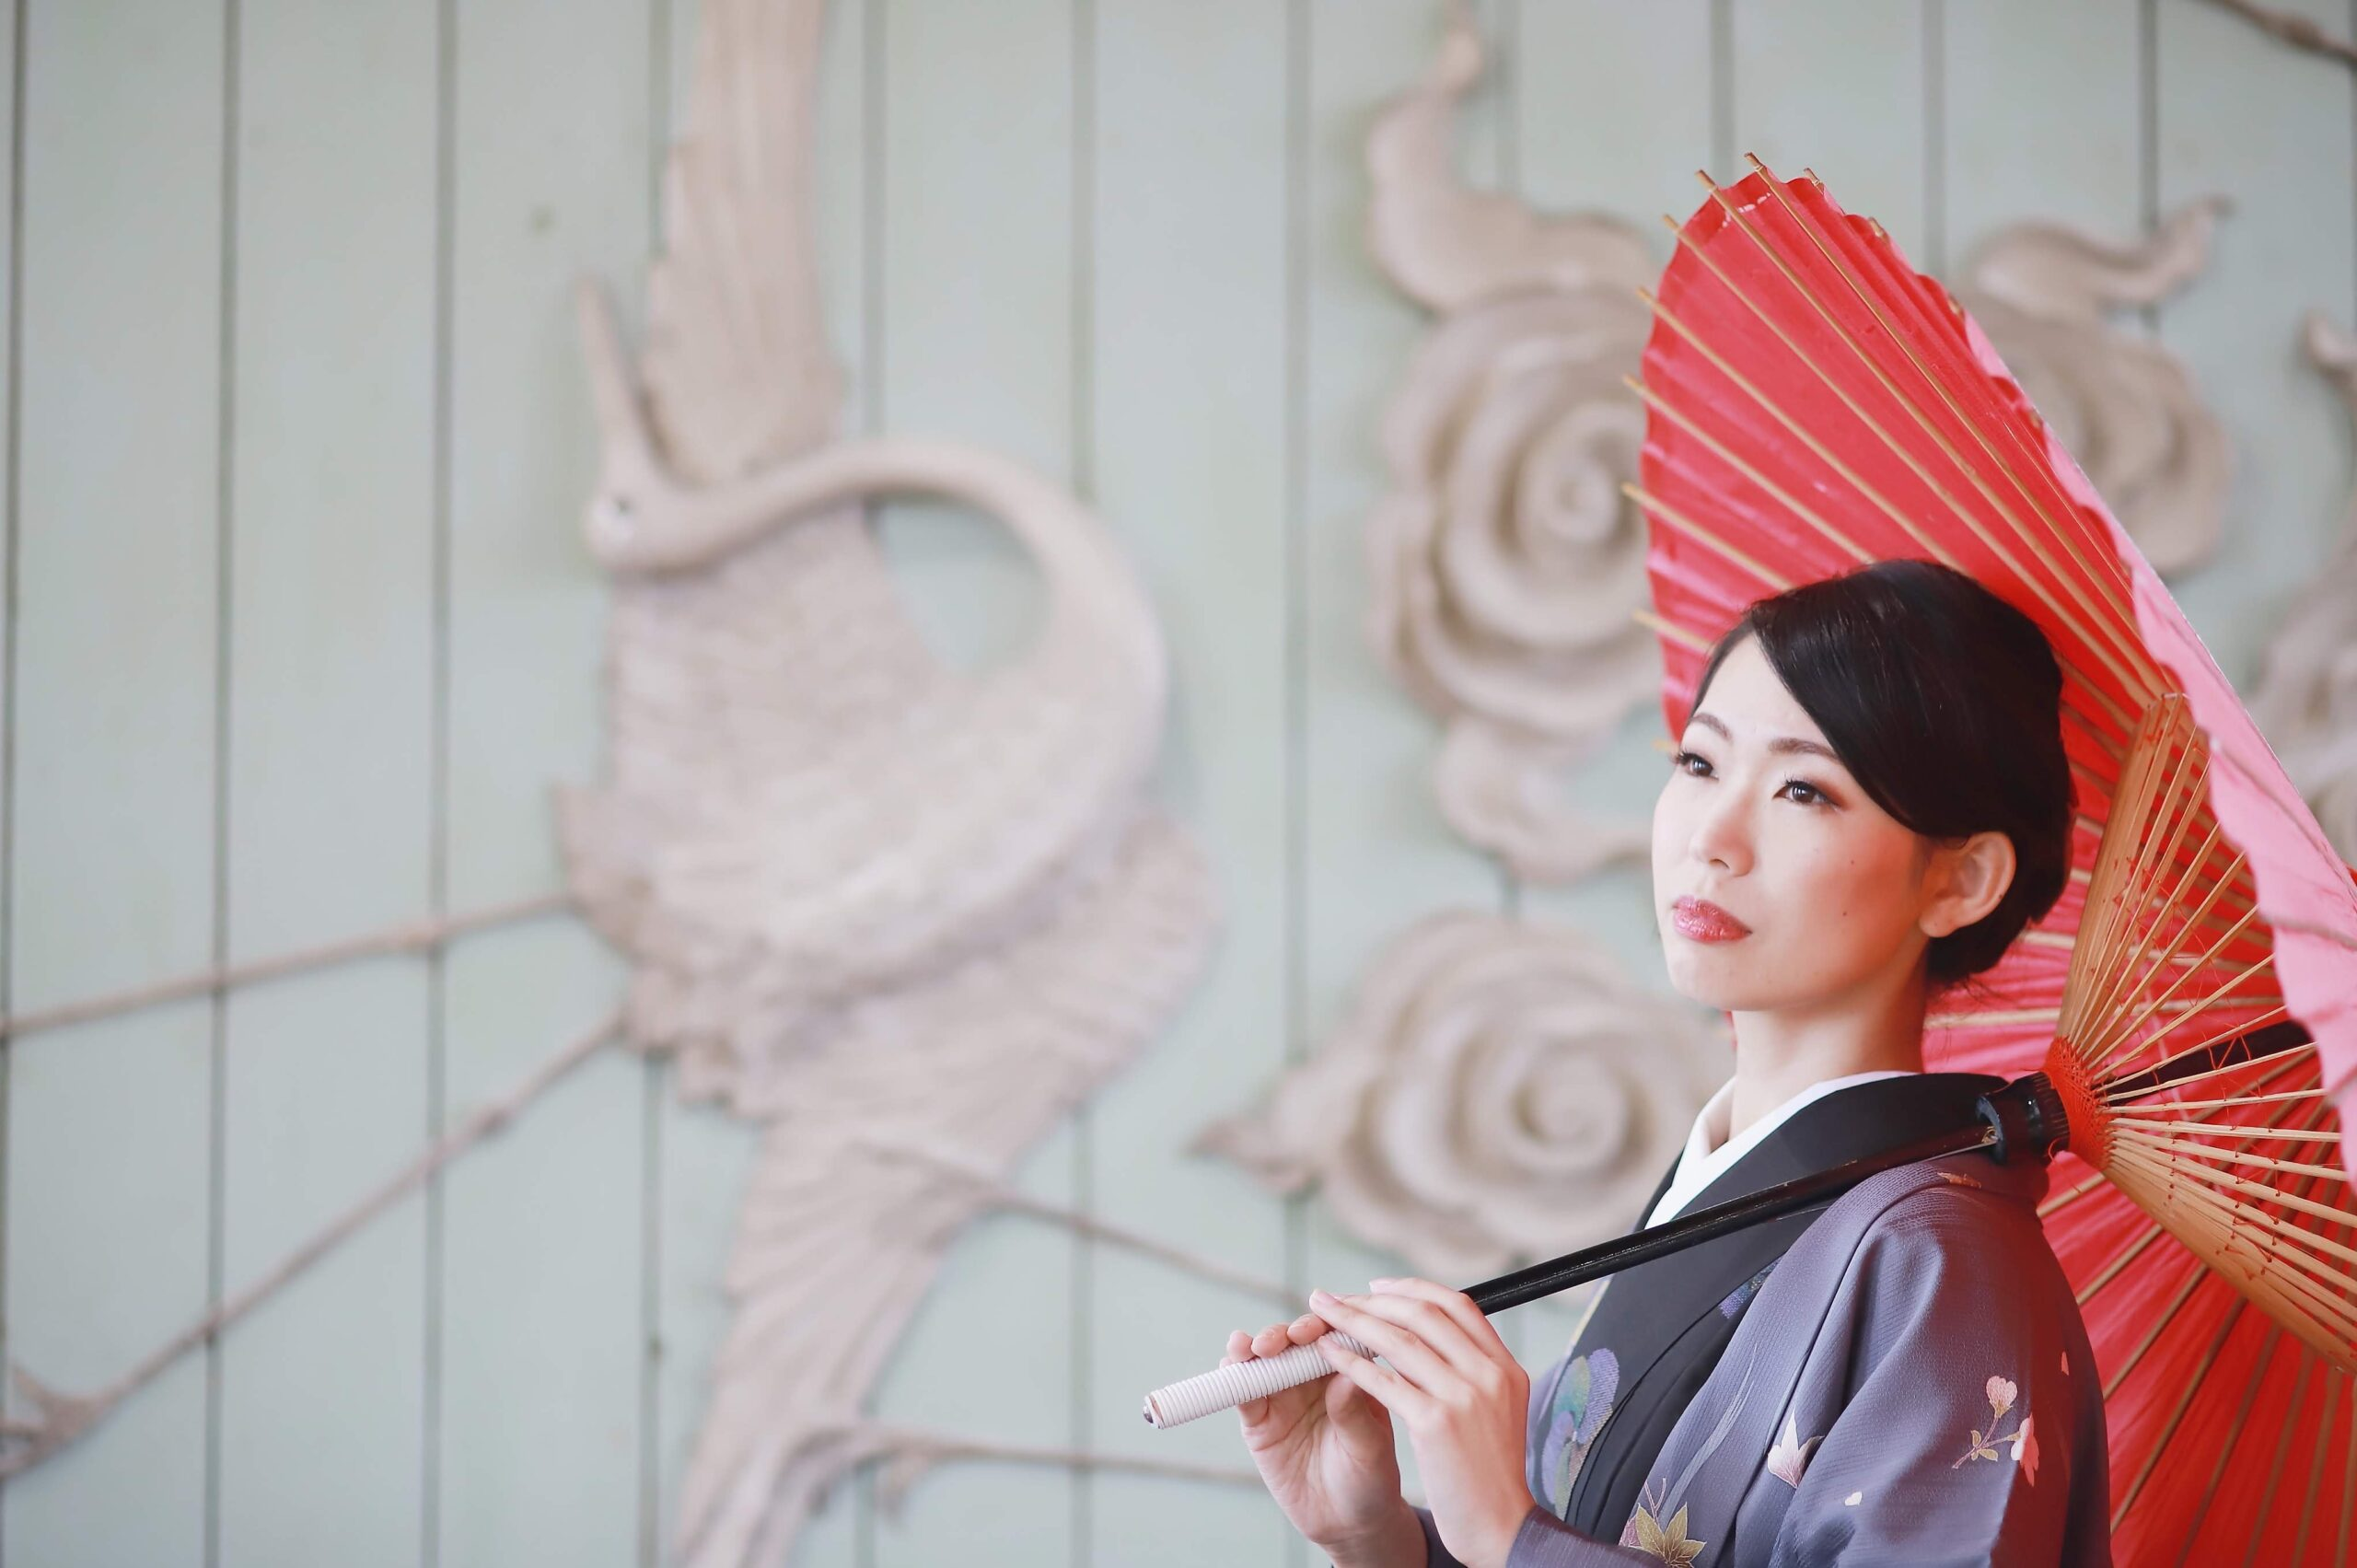 Satomi Akizuki continues to triumph